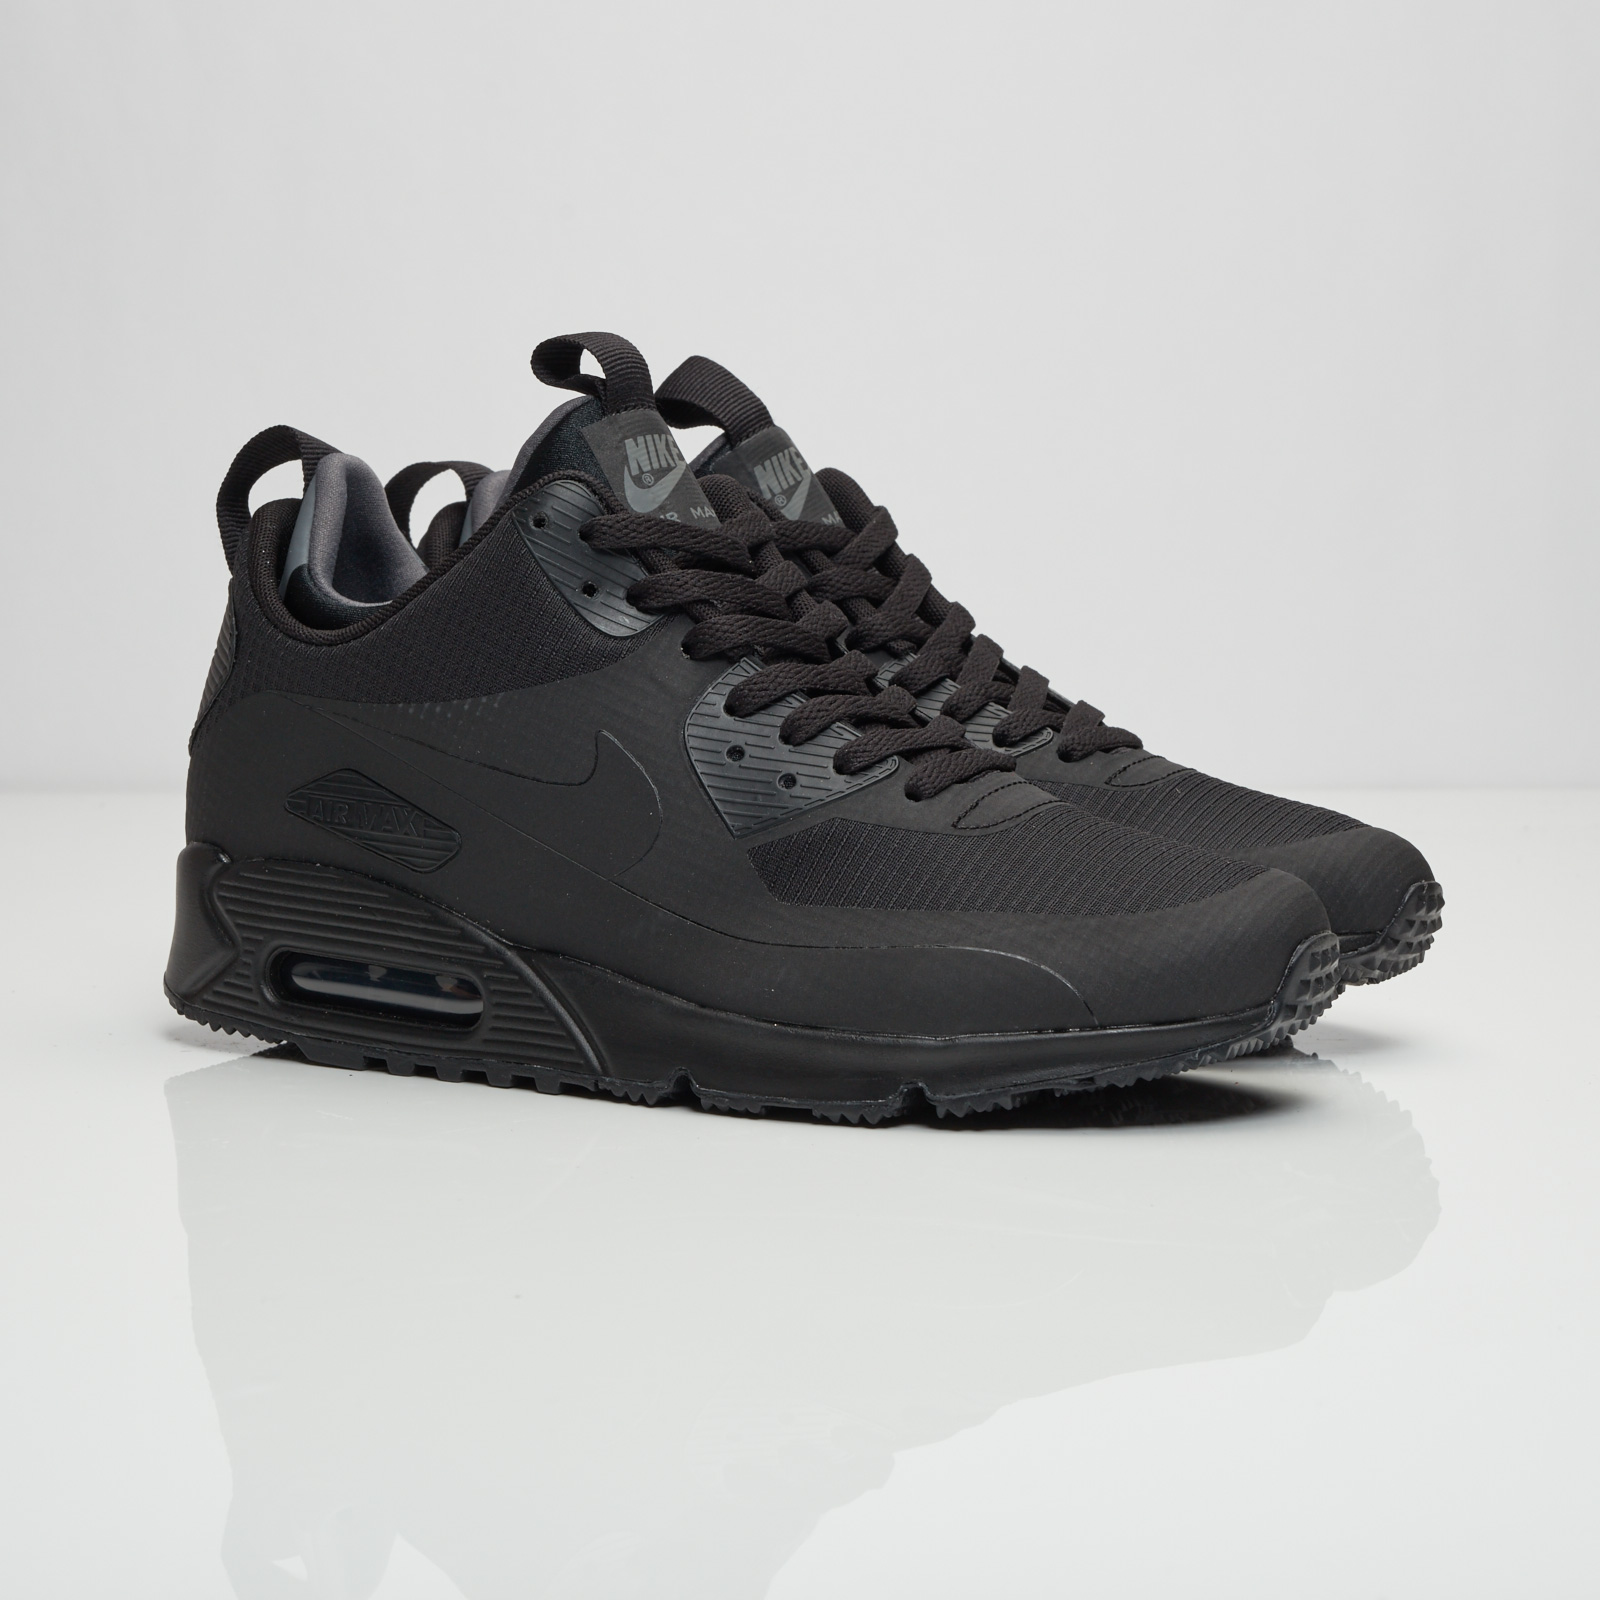 Nike Air Max 90 Mid Winter 806808 002 Sneakersnstuff